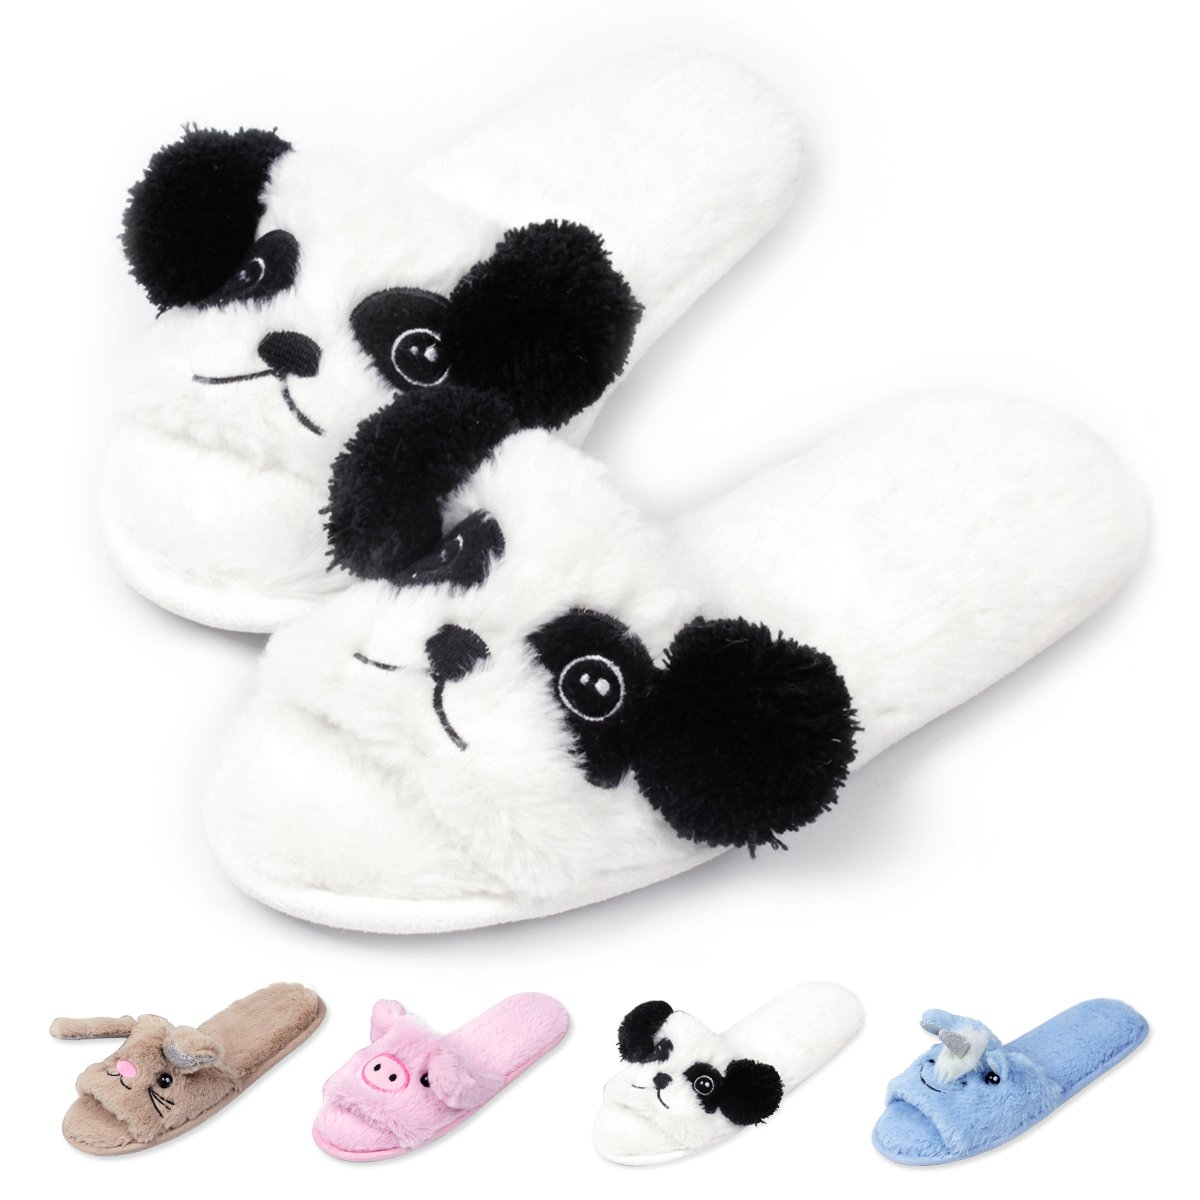 Womens Open Toe Slippers | Cute Bunny Unicorn Animal Slipper | Soft Fleece Memory Foam Clog | Anti-Slip Sole Indoor Outdoor Shoes | Flip Flop Spa Slippers (7-8, WhitePanda)